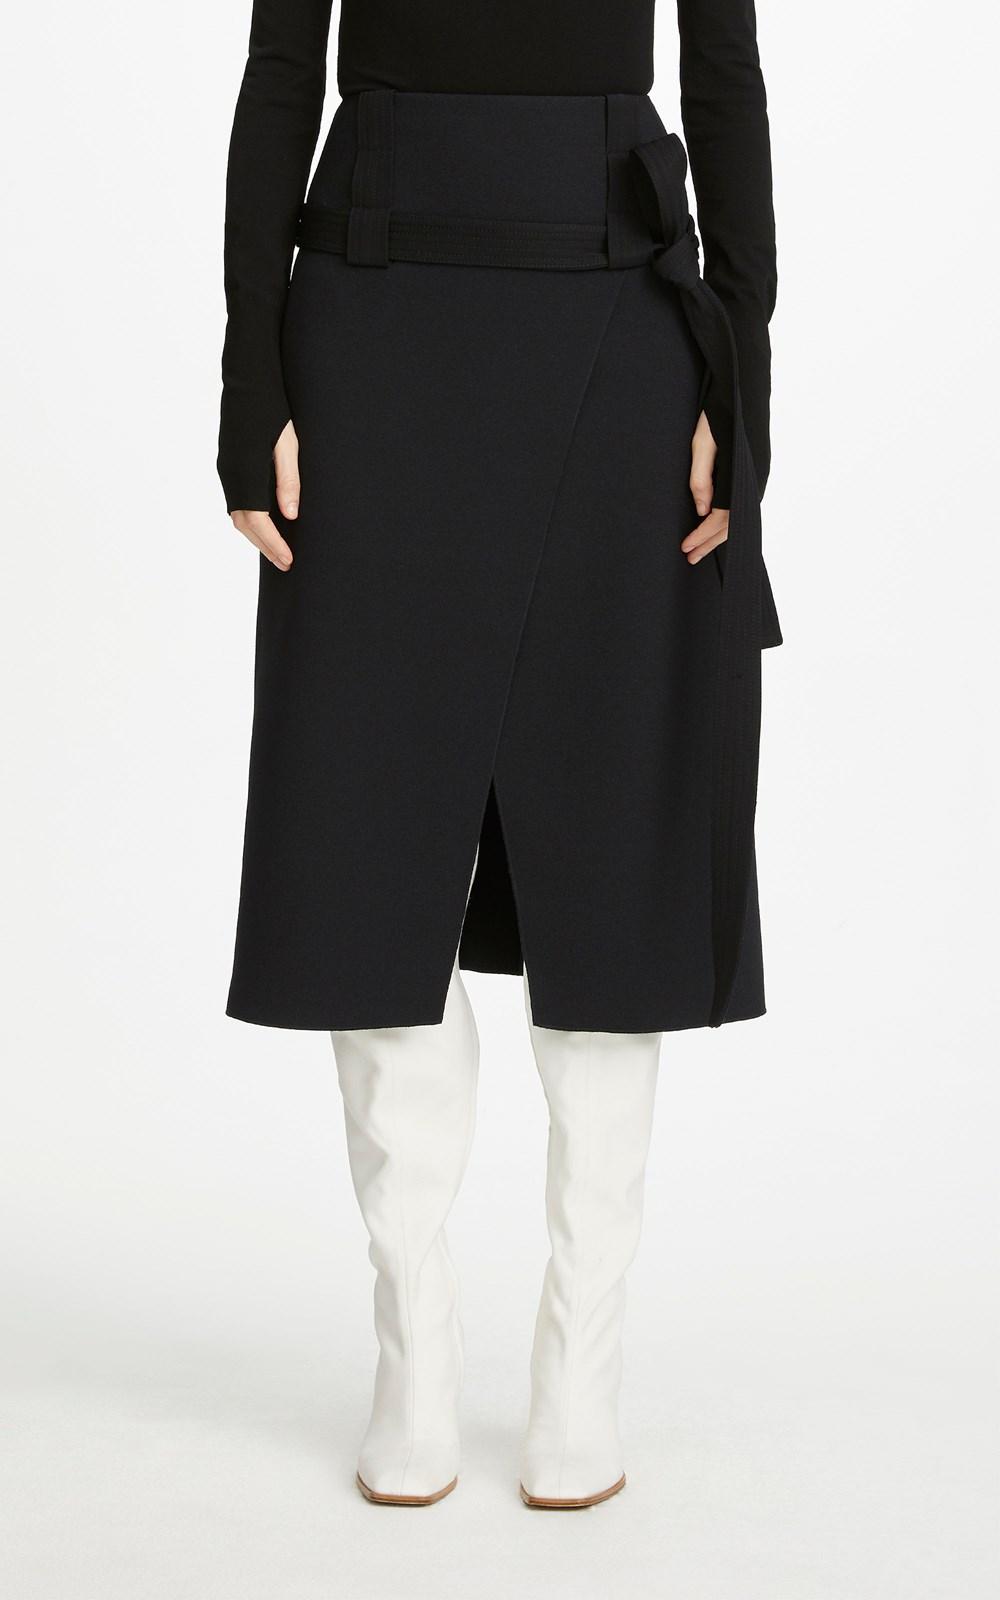 Skirts | INTERCHANGE BELTED SKIRT